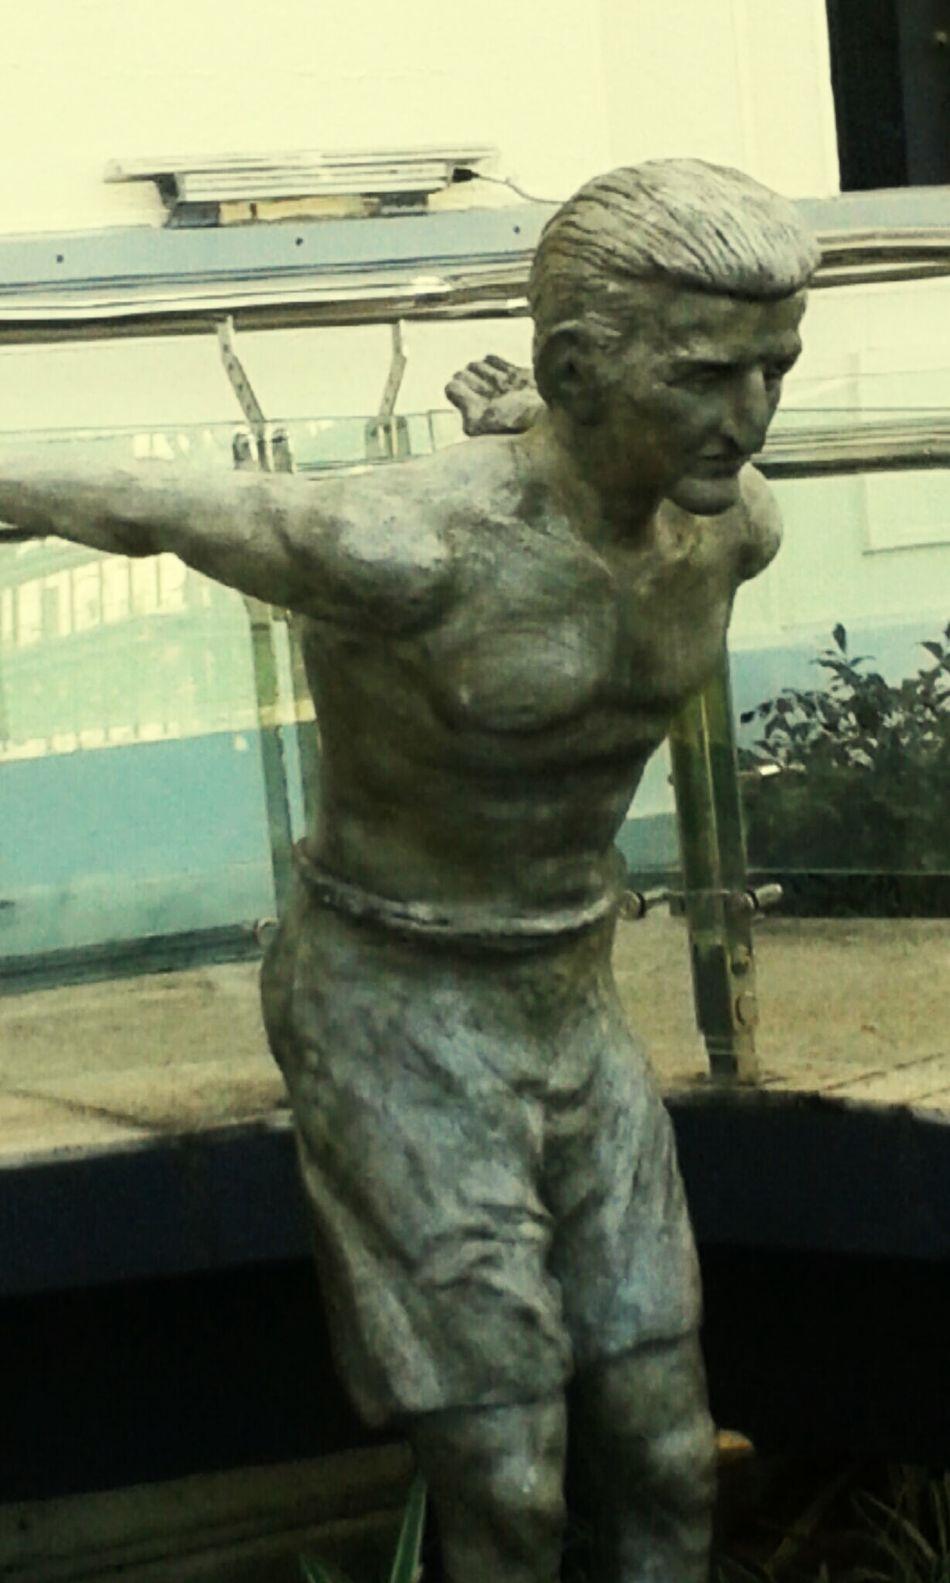 A estátua está melhor que eu! lol Taking Photos Streetart Streetphotography Brazilian Sculpture Statue Estatua History Popular Art Brazil Historical Monuments Old